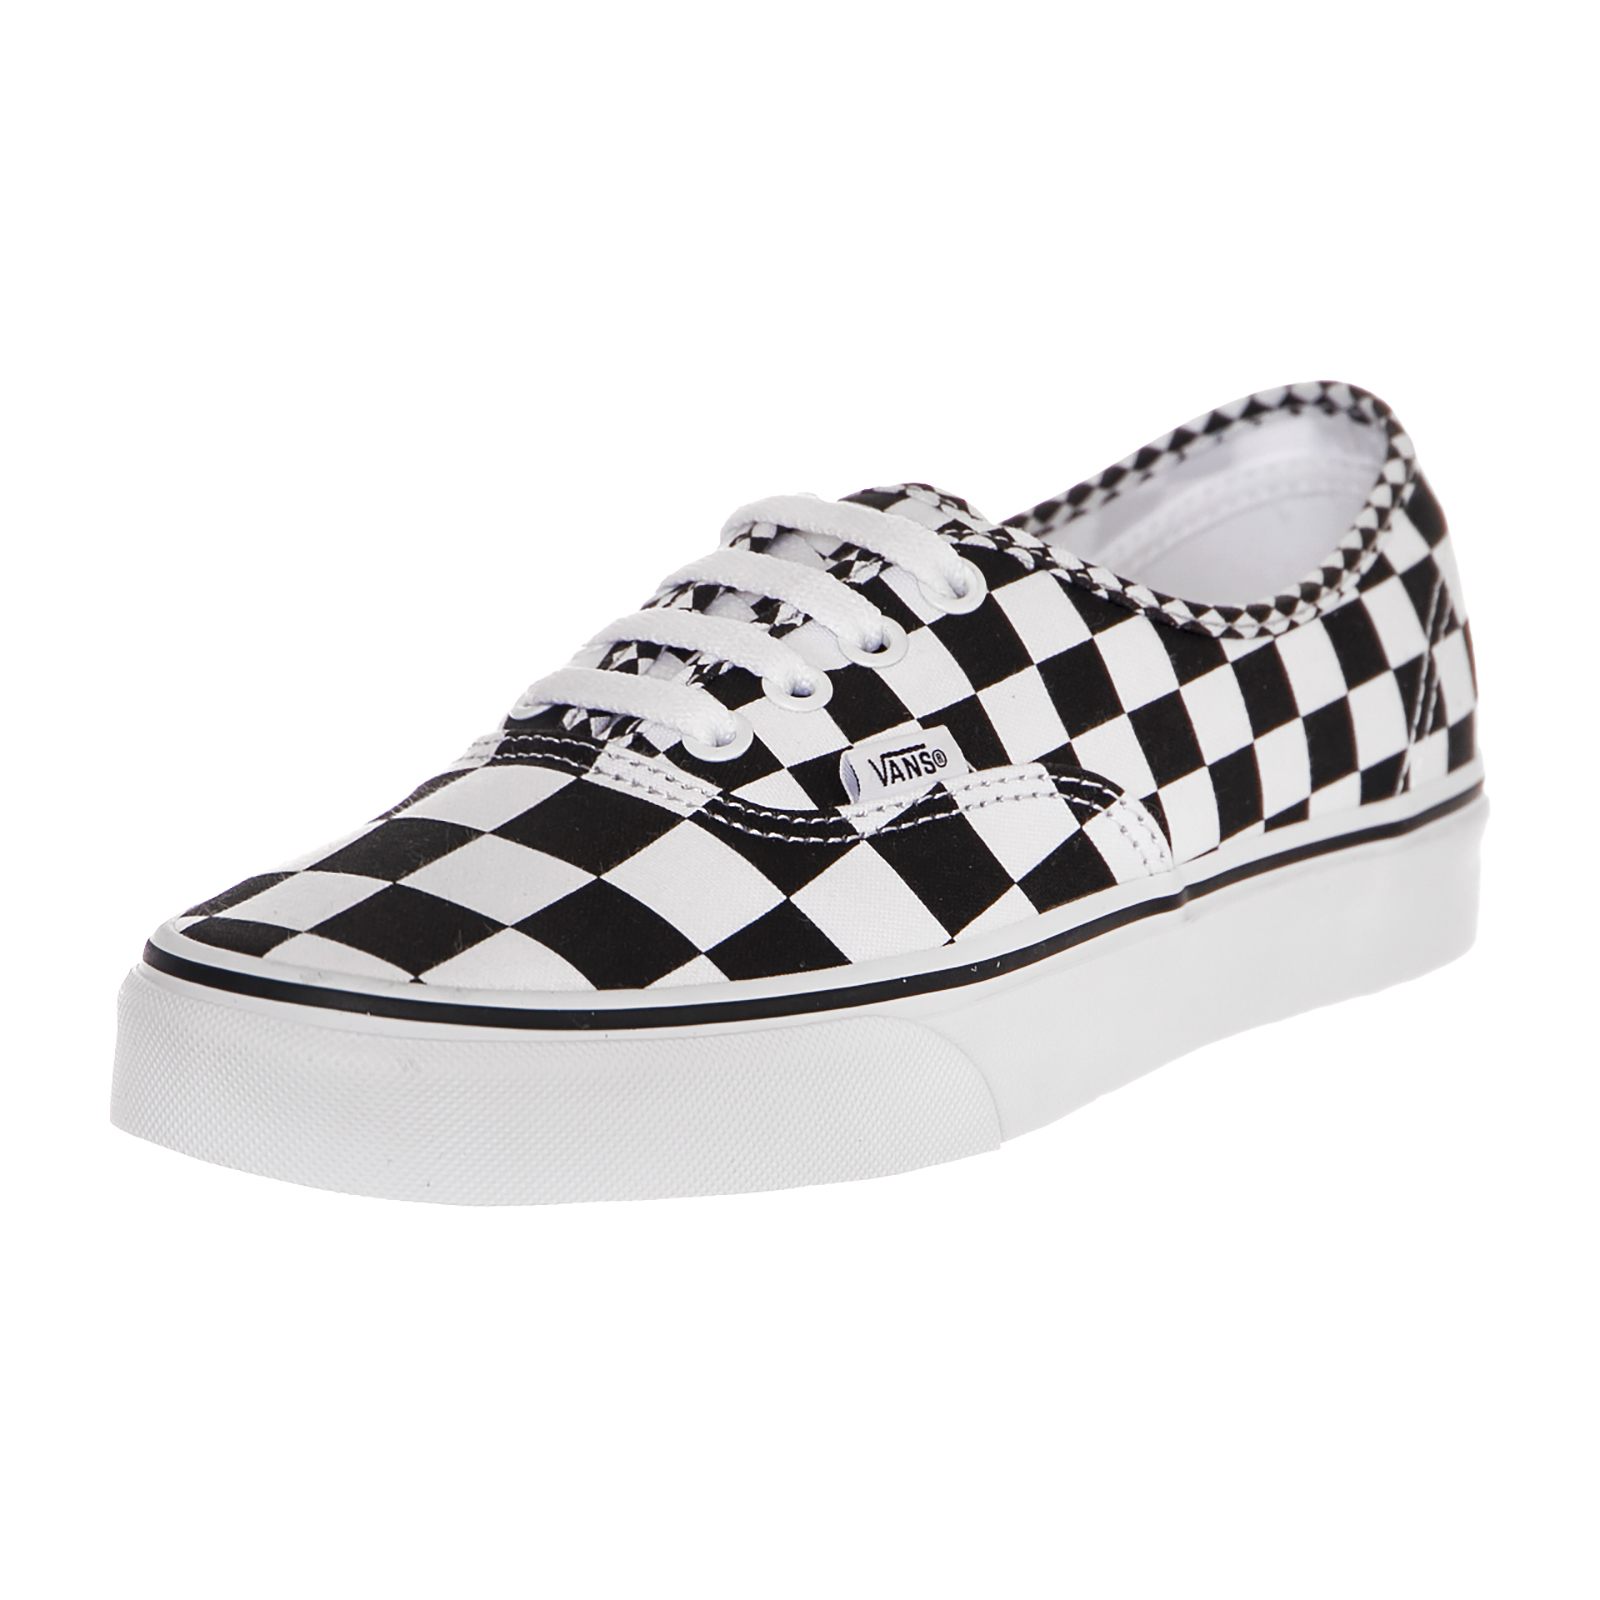 Vans (Mezclar Zapatillas Ua Auténtico (Mezclar Vans Checker Multicolor 89727e